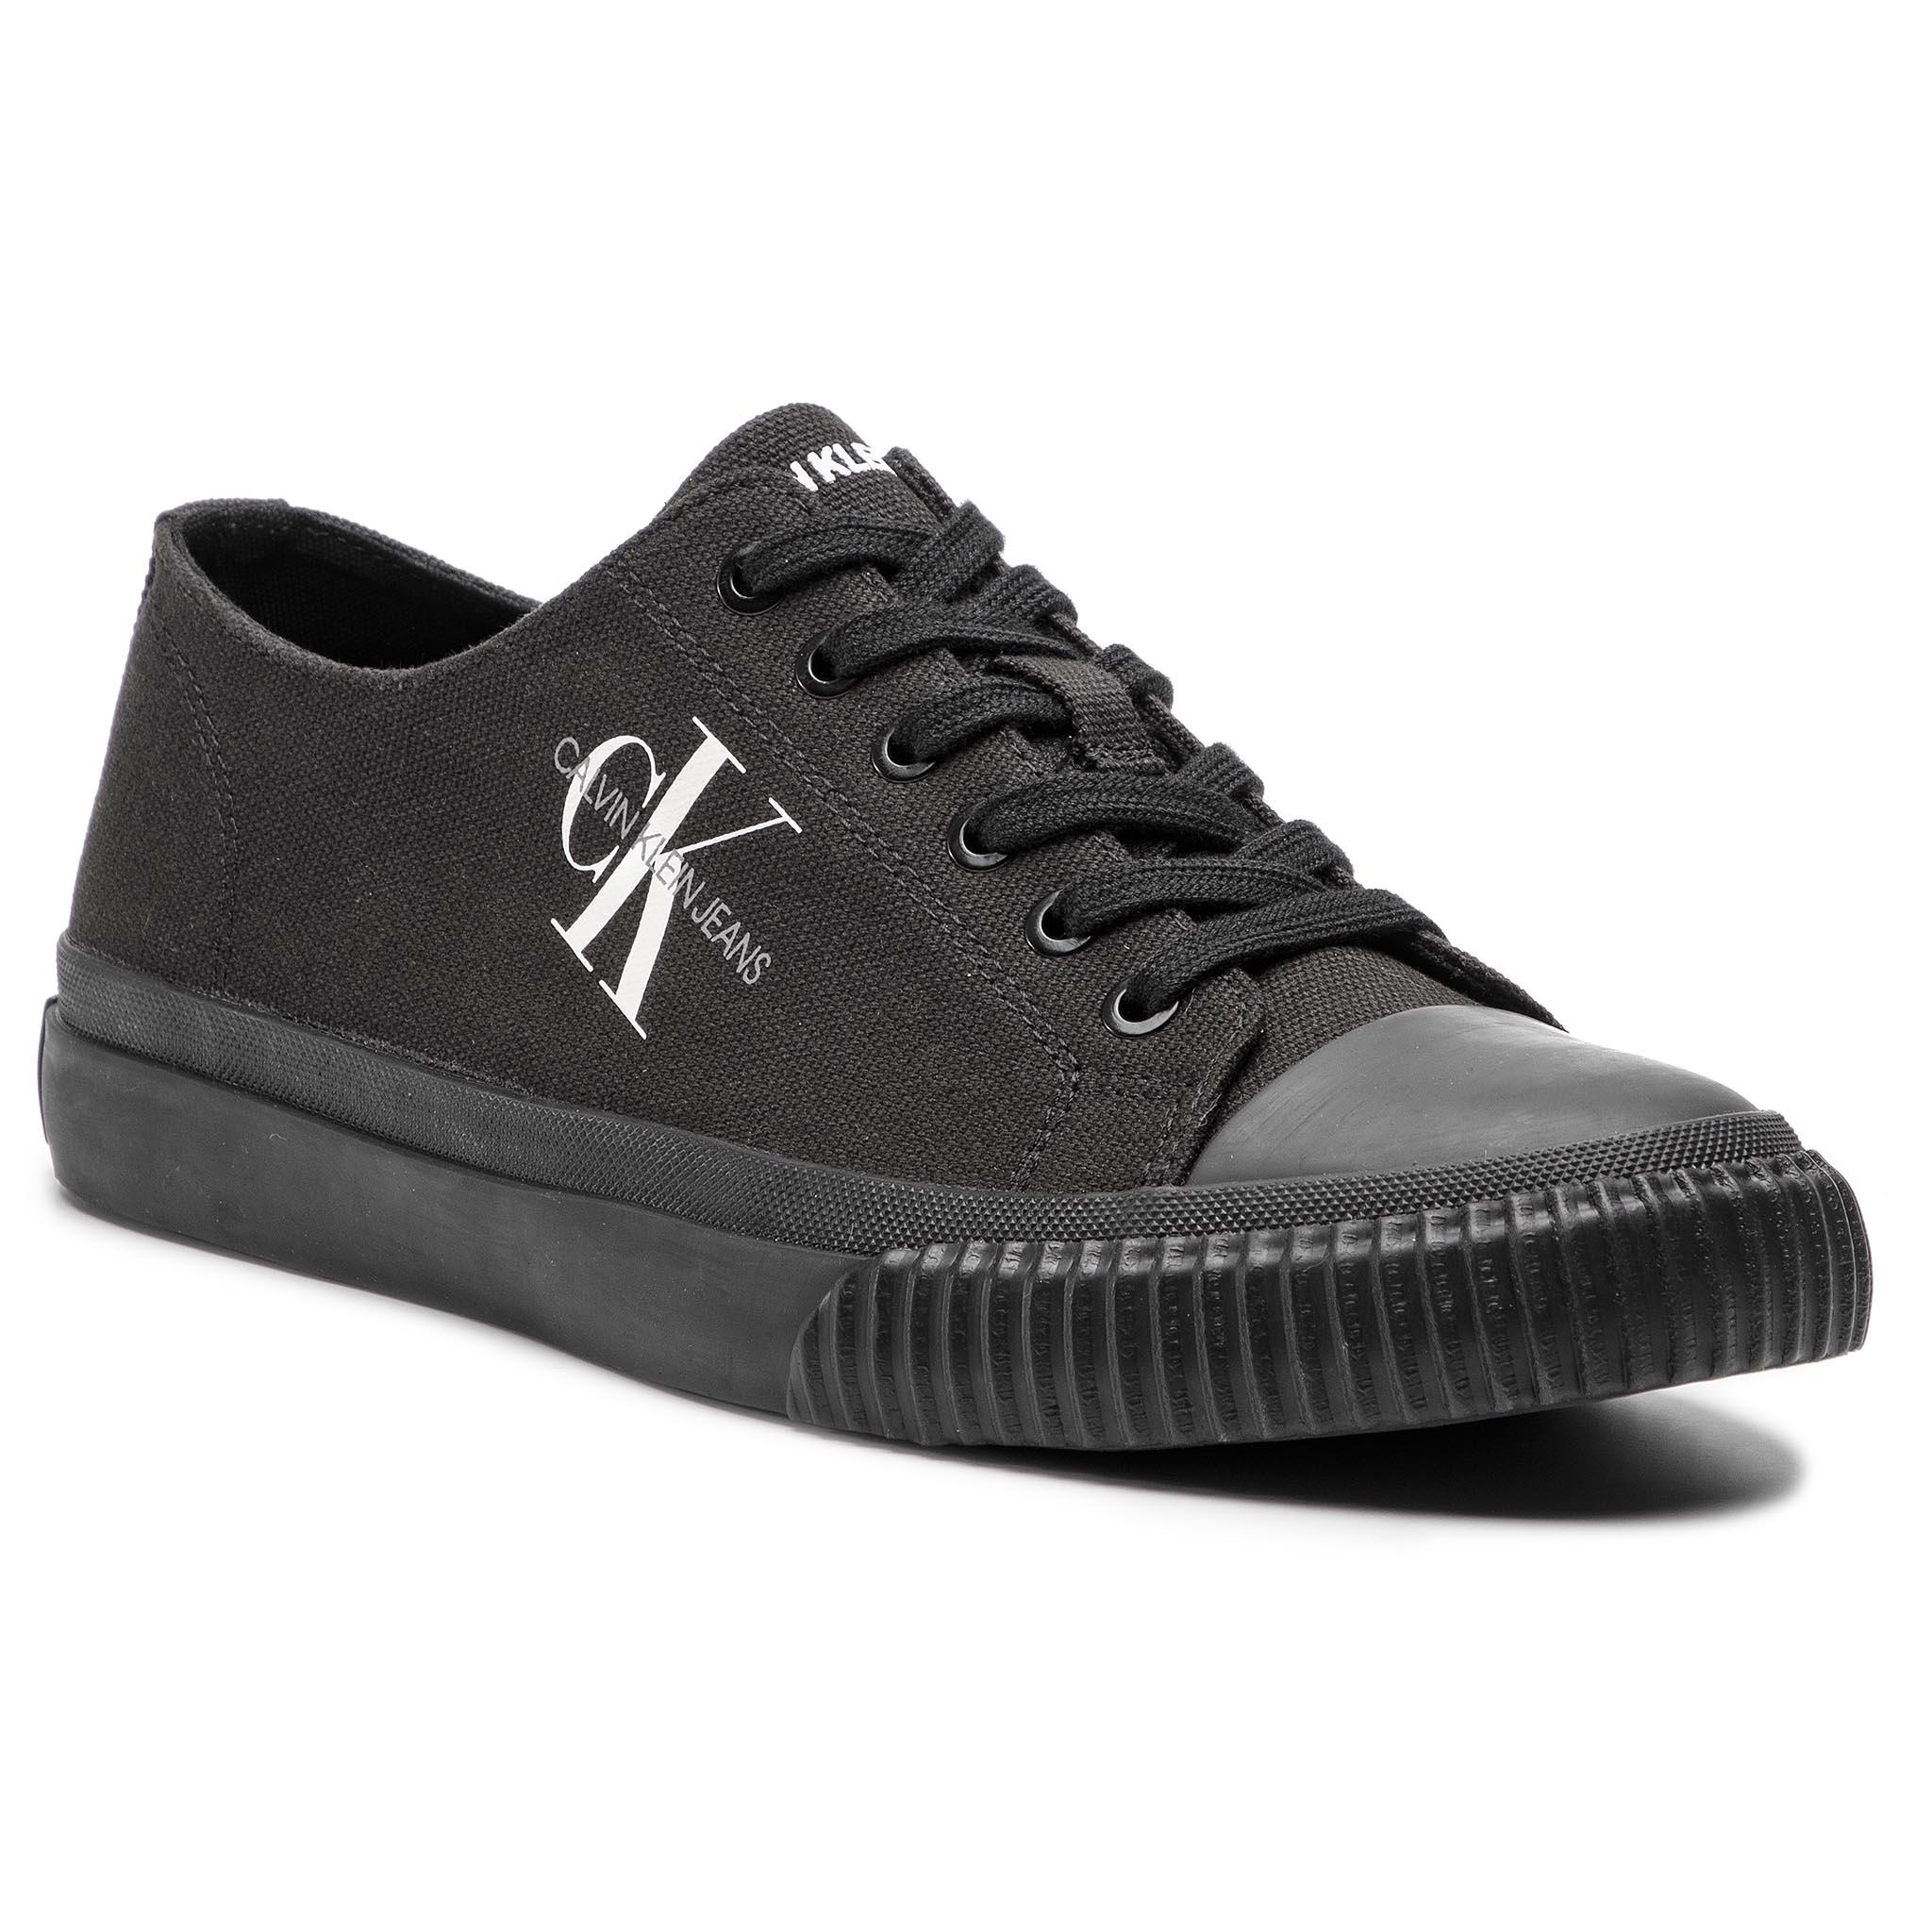 54cd6c6a1 Plimsolls CALVIN KLEIN JEANS - Arnold S0369 Black - Sneakers - Low ...